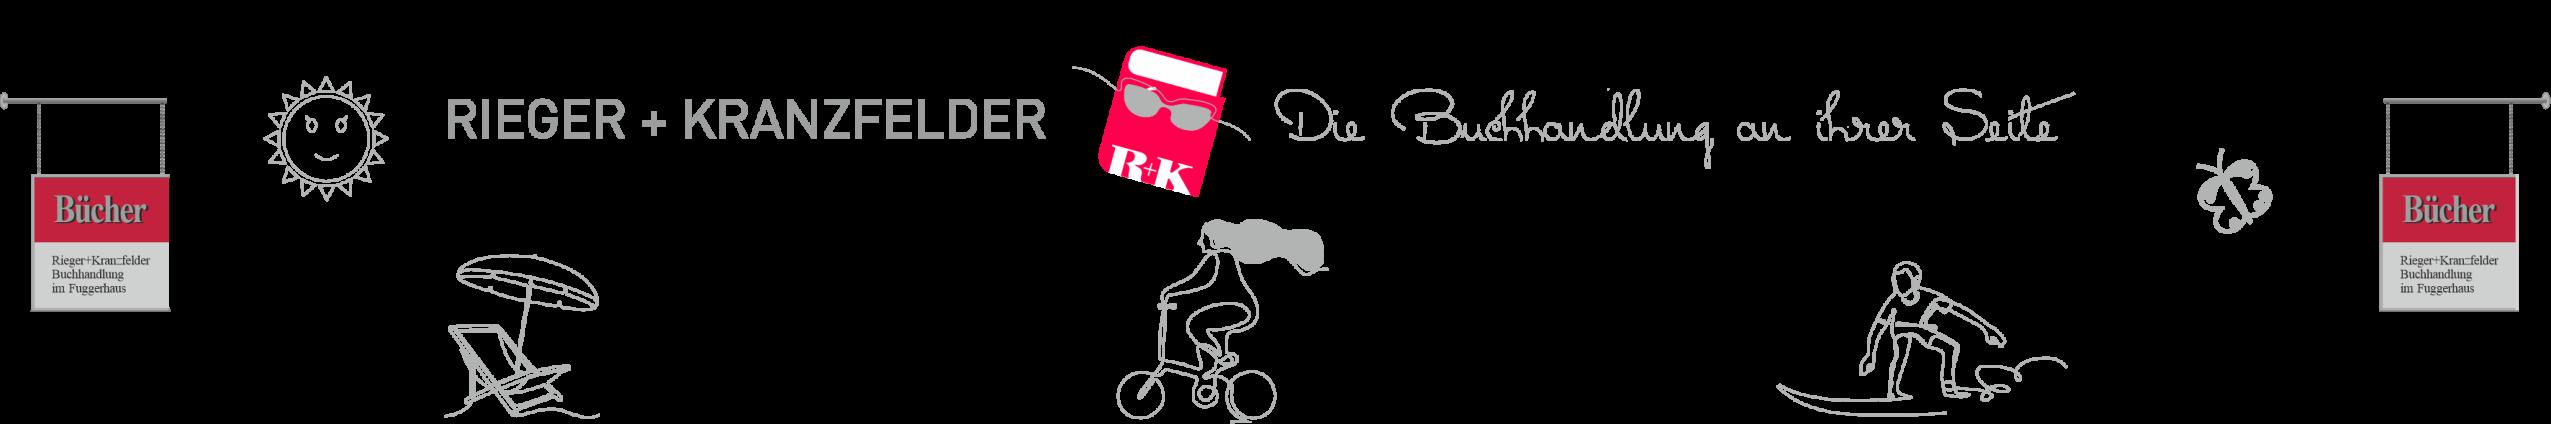 Buchhandlung Rieger+Kranzfelder im Fuggerhaus in Augsburg